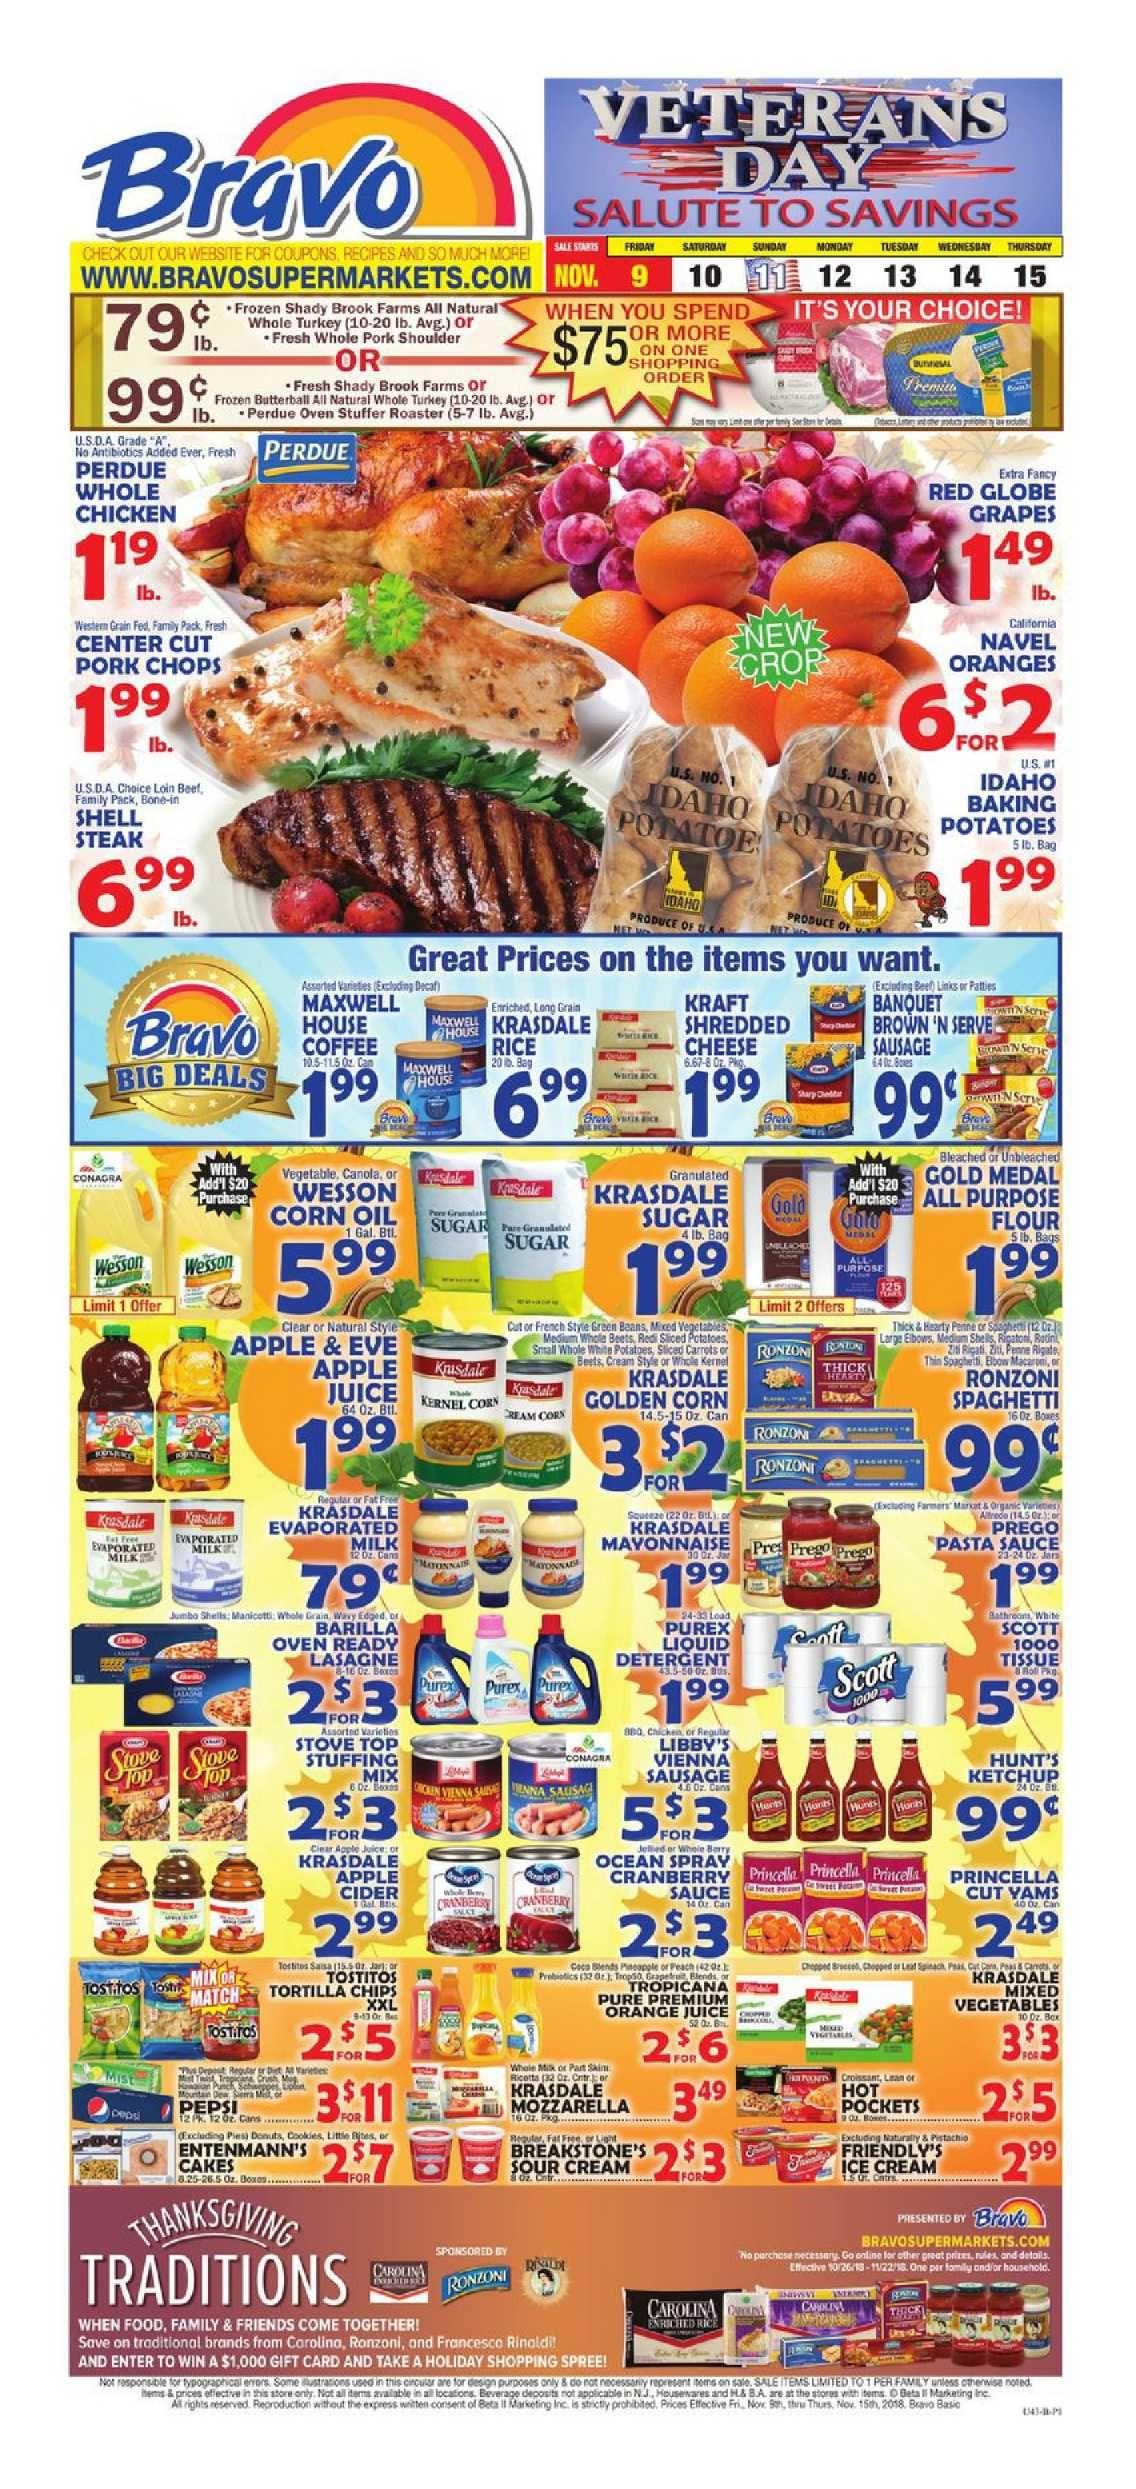 Bravo supermarkets weekly ad flyer july 4 10 2019